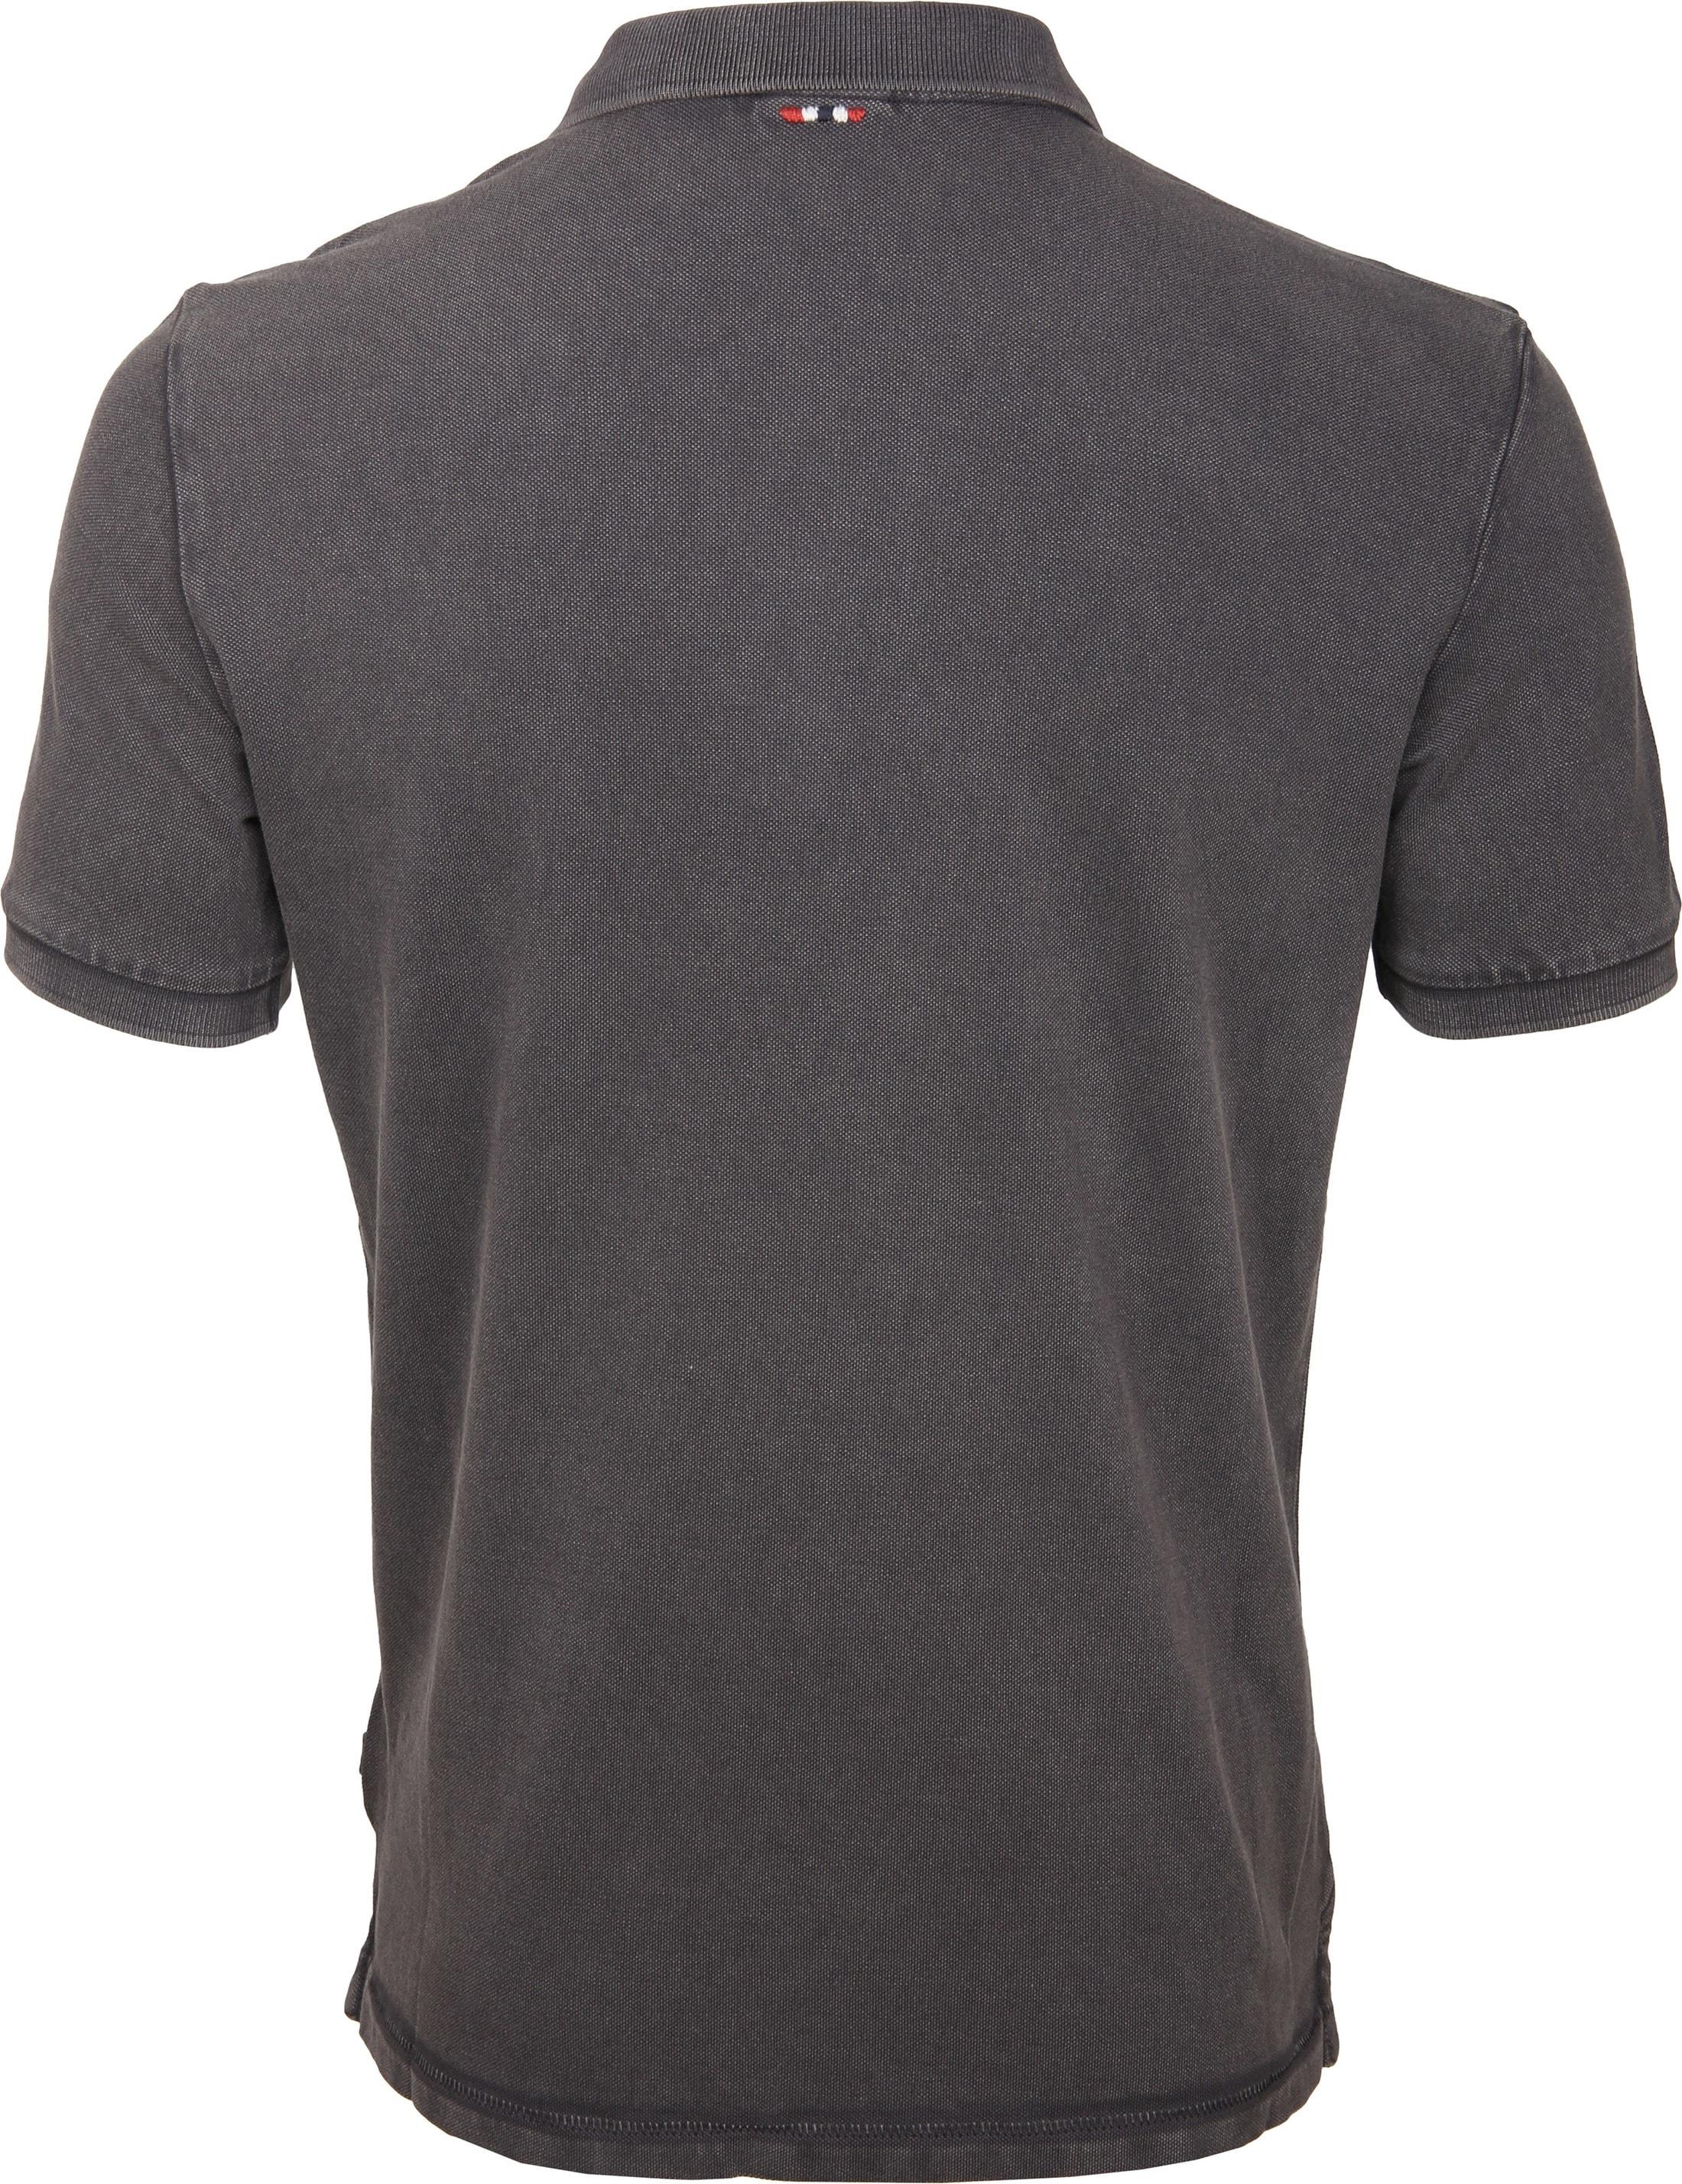 Napapijri Poloshirt Elbas 2 Dark Grey foto 2